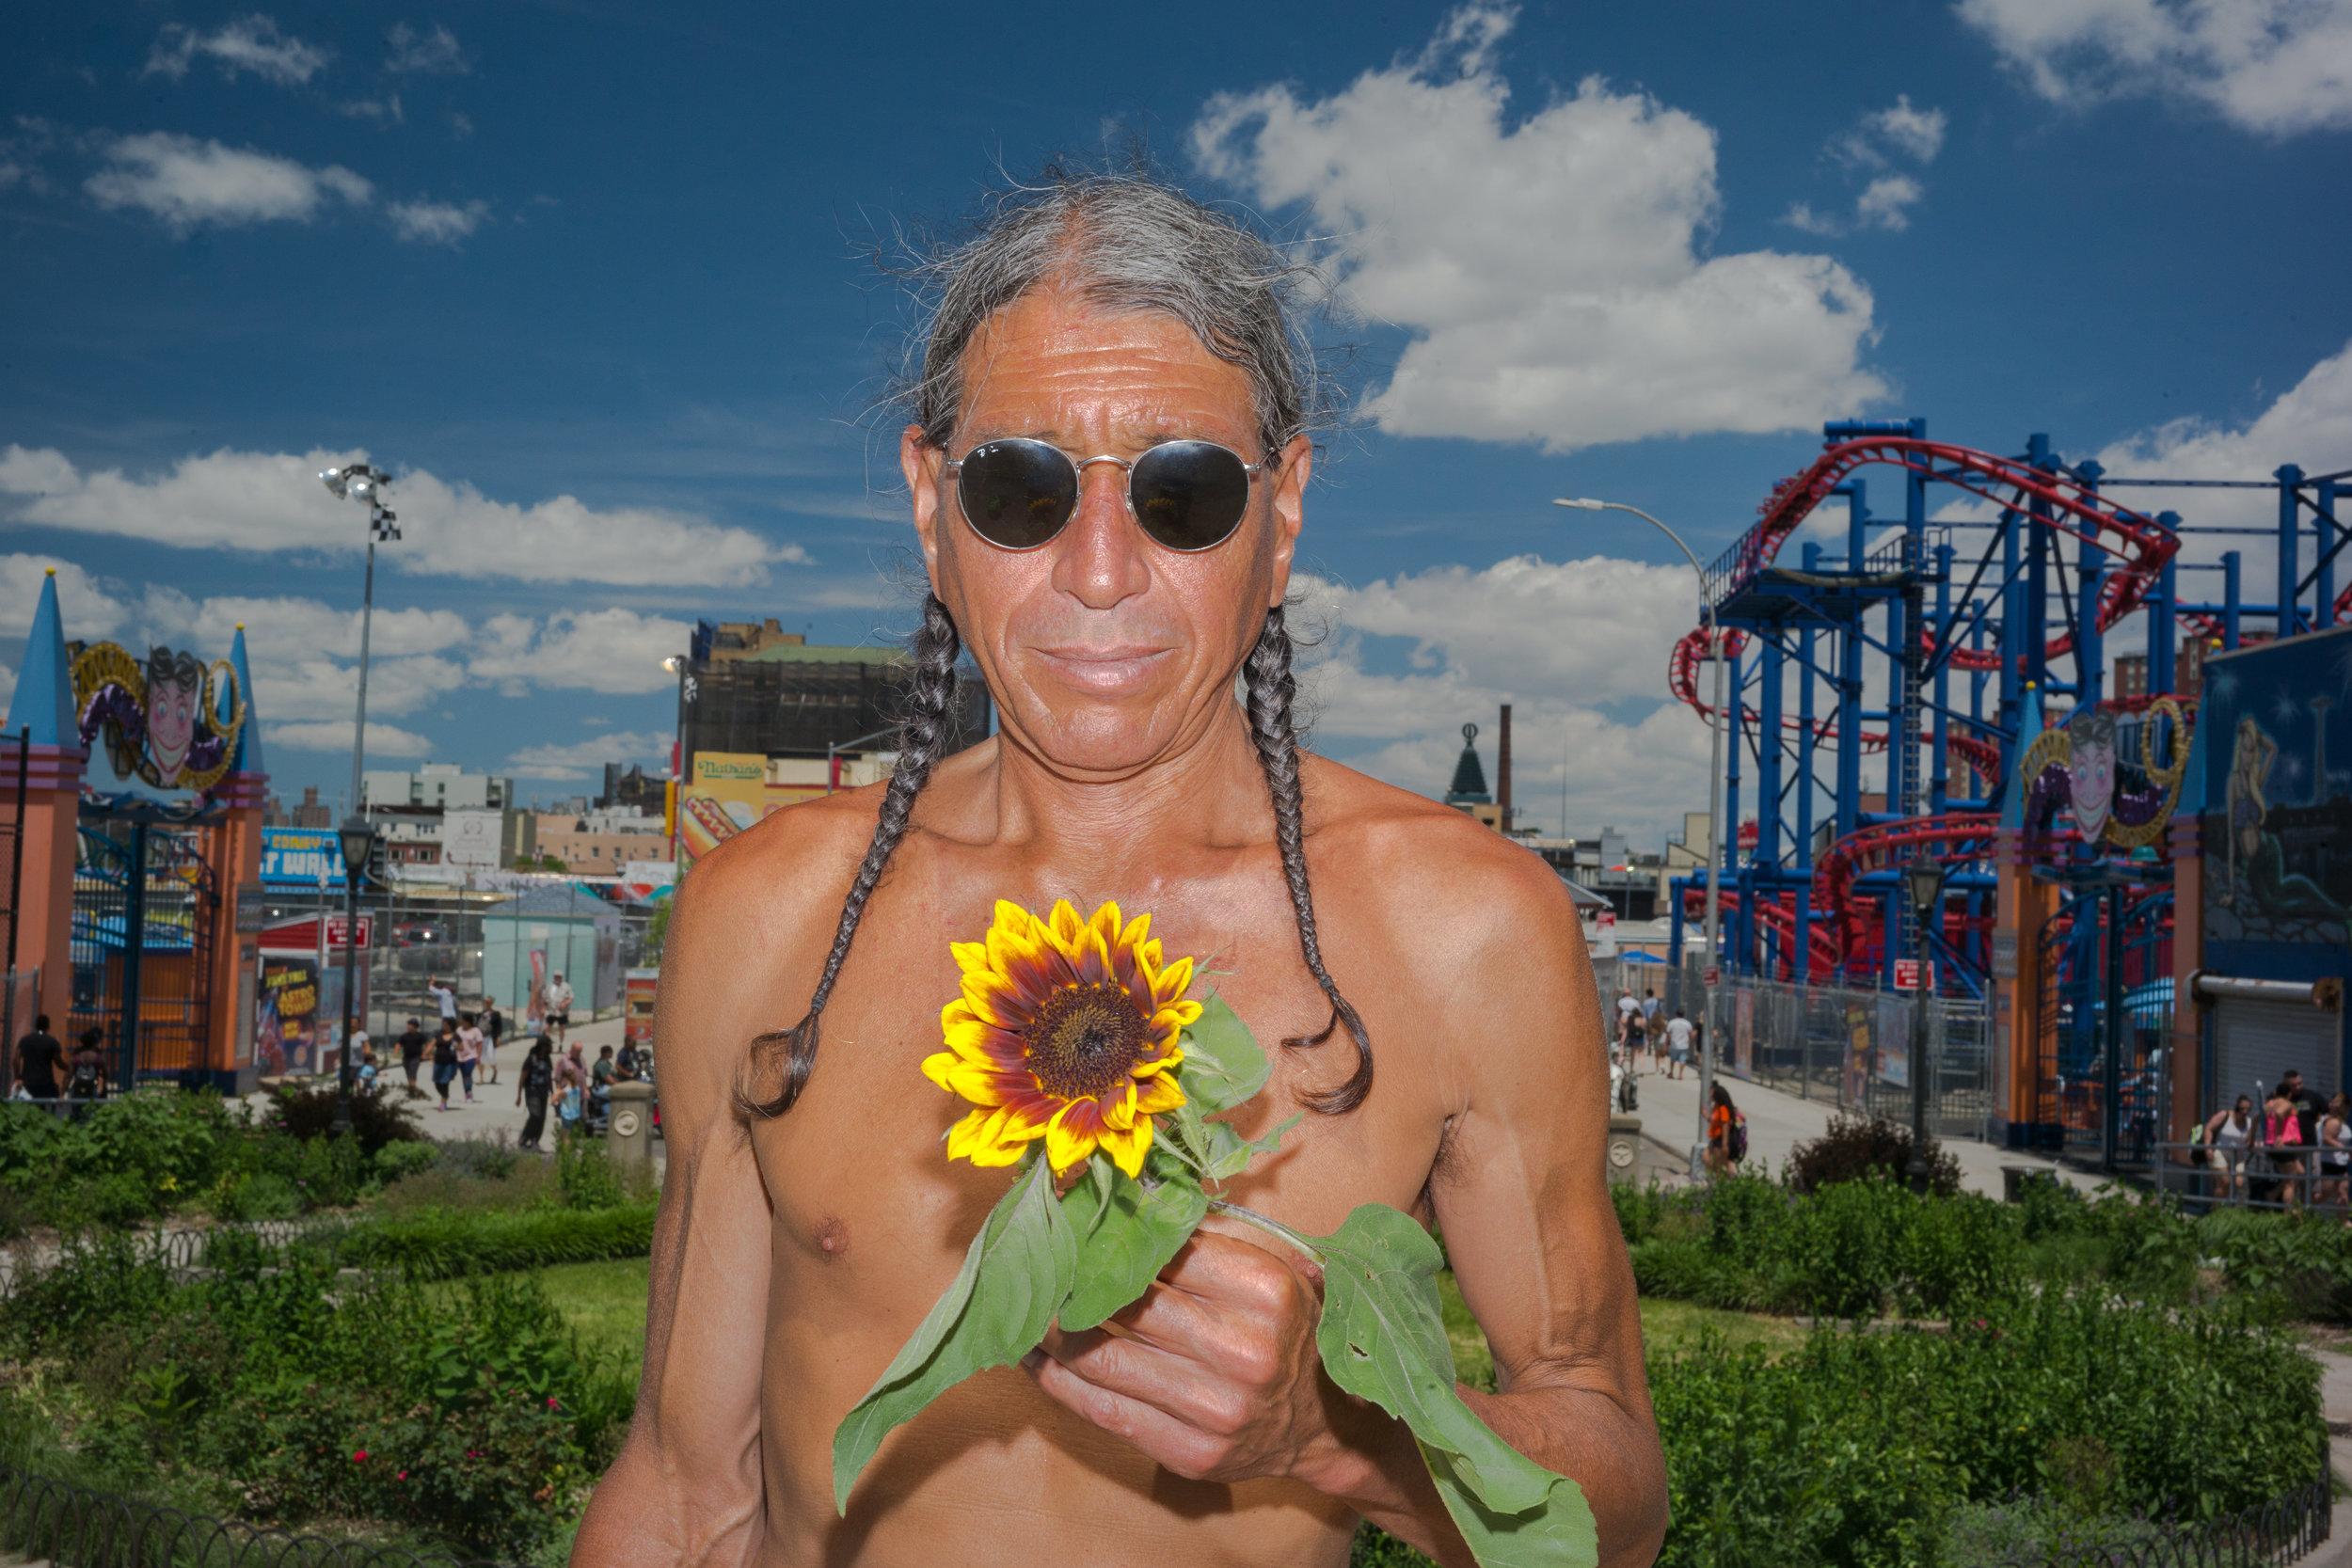 Copy of Lot 578 Beach Body Bingo - Indian Summer - Photograph